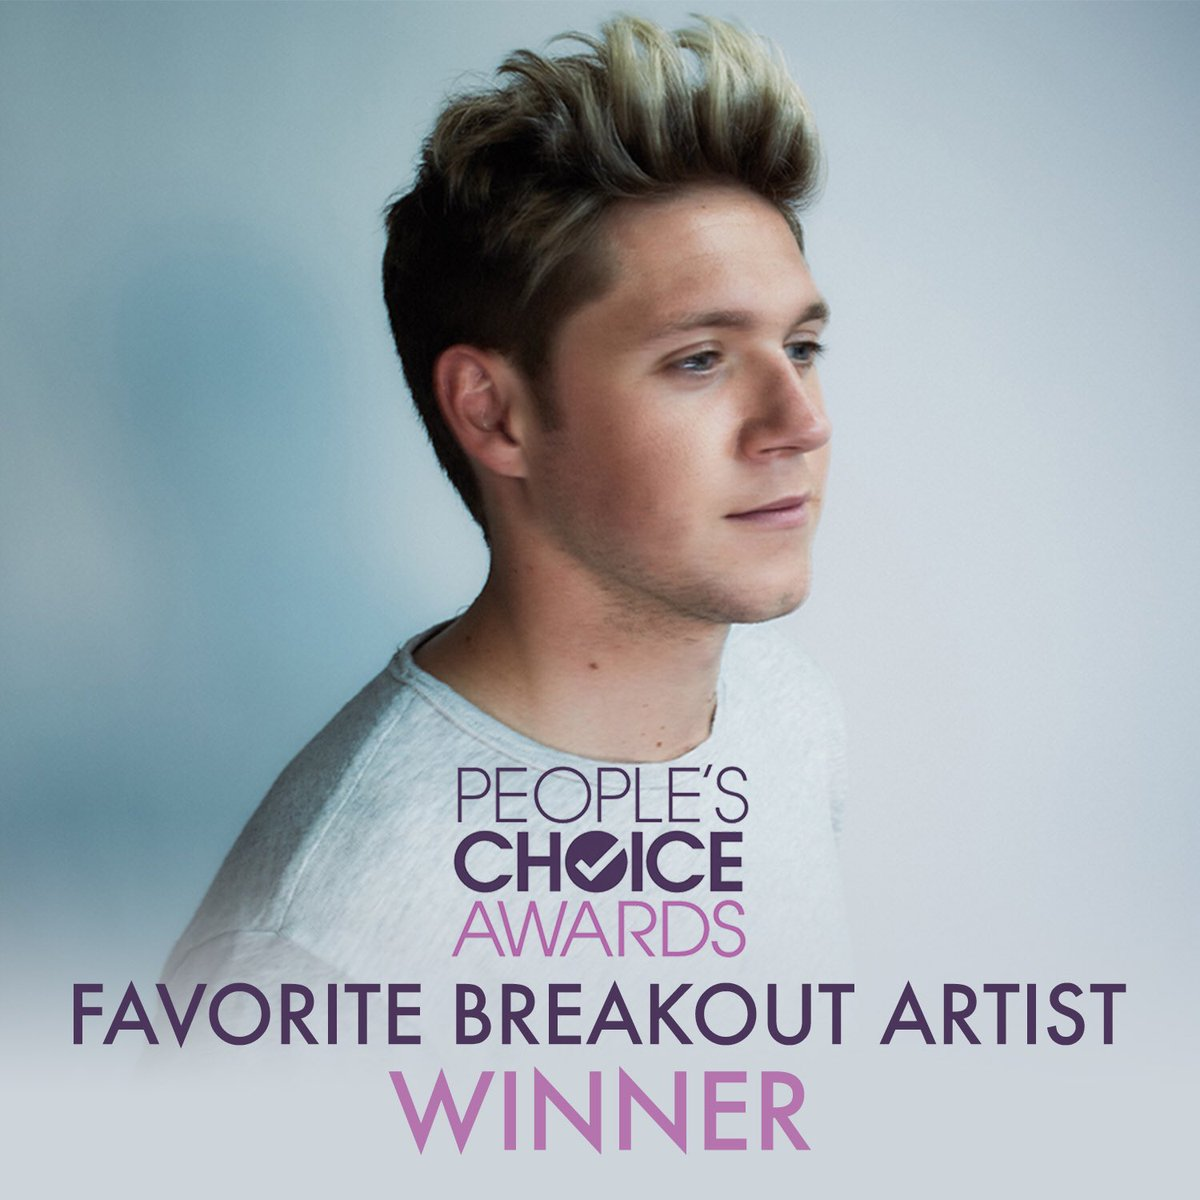 CONGRATS @NiallOfficial on your @peopleschoice award for Favorite Breakout Artist!